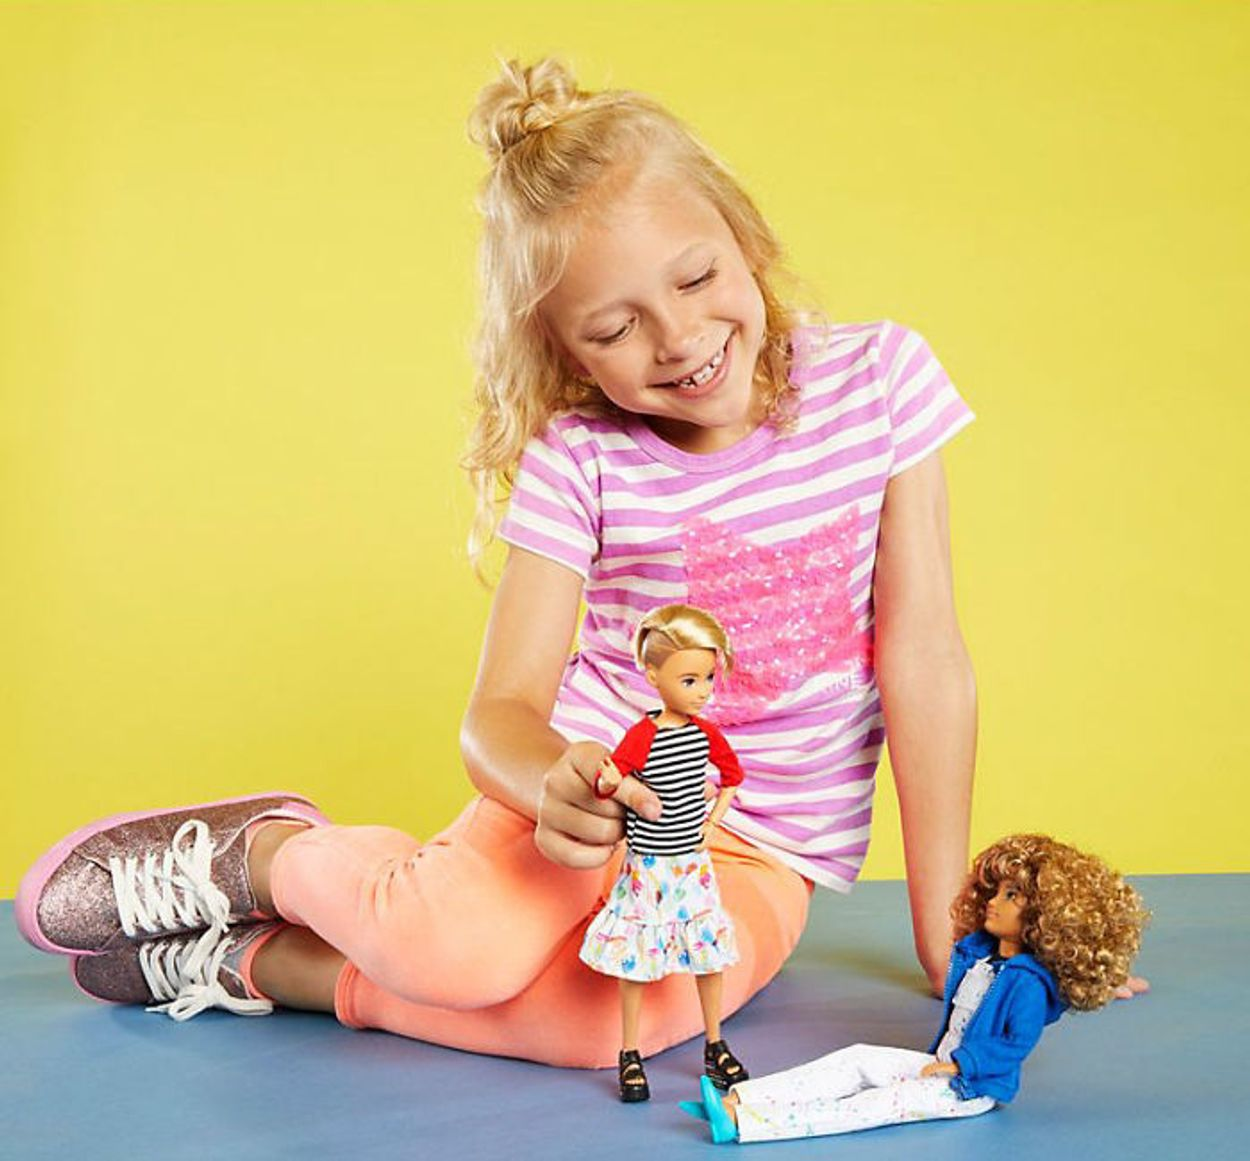 End 5d8c69bf714f6-gender-neutral-dolls-toy-company-mattel-1-13-5d8b35131f039__700